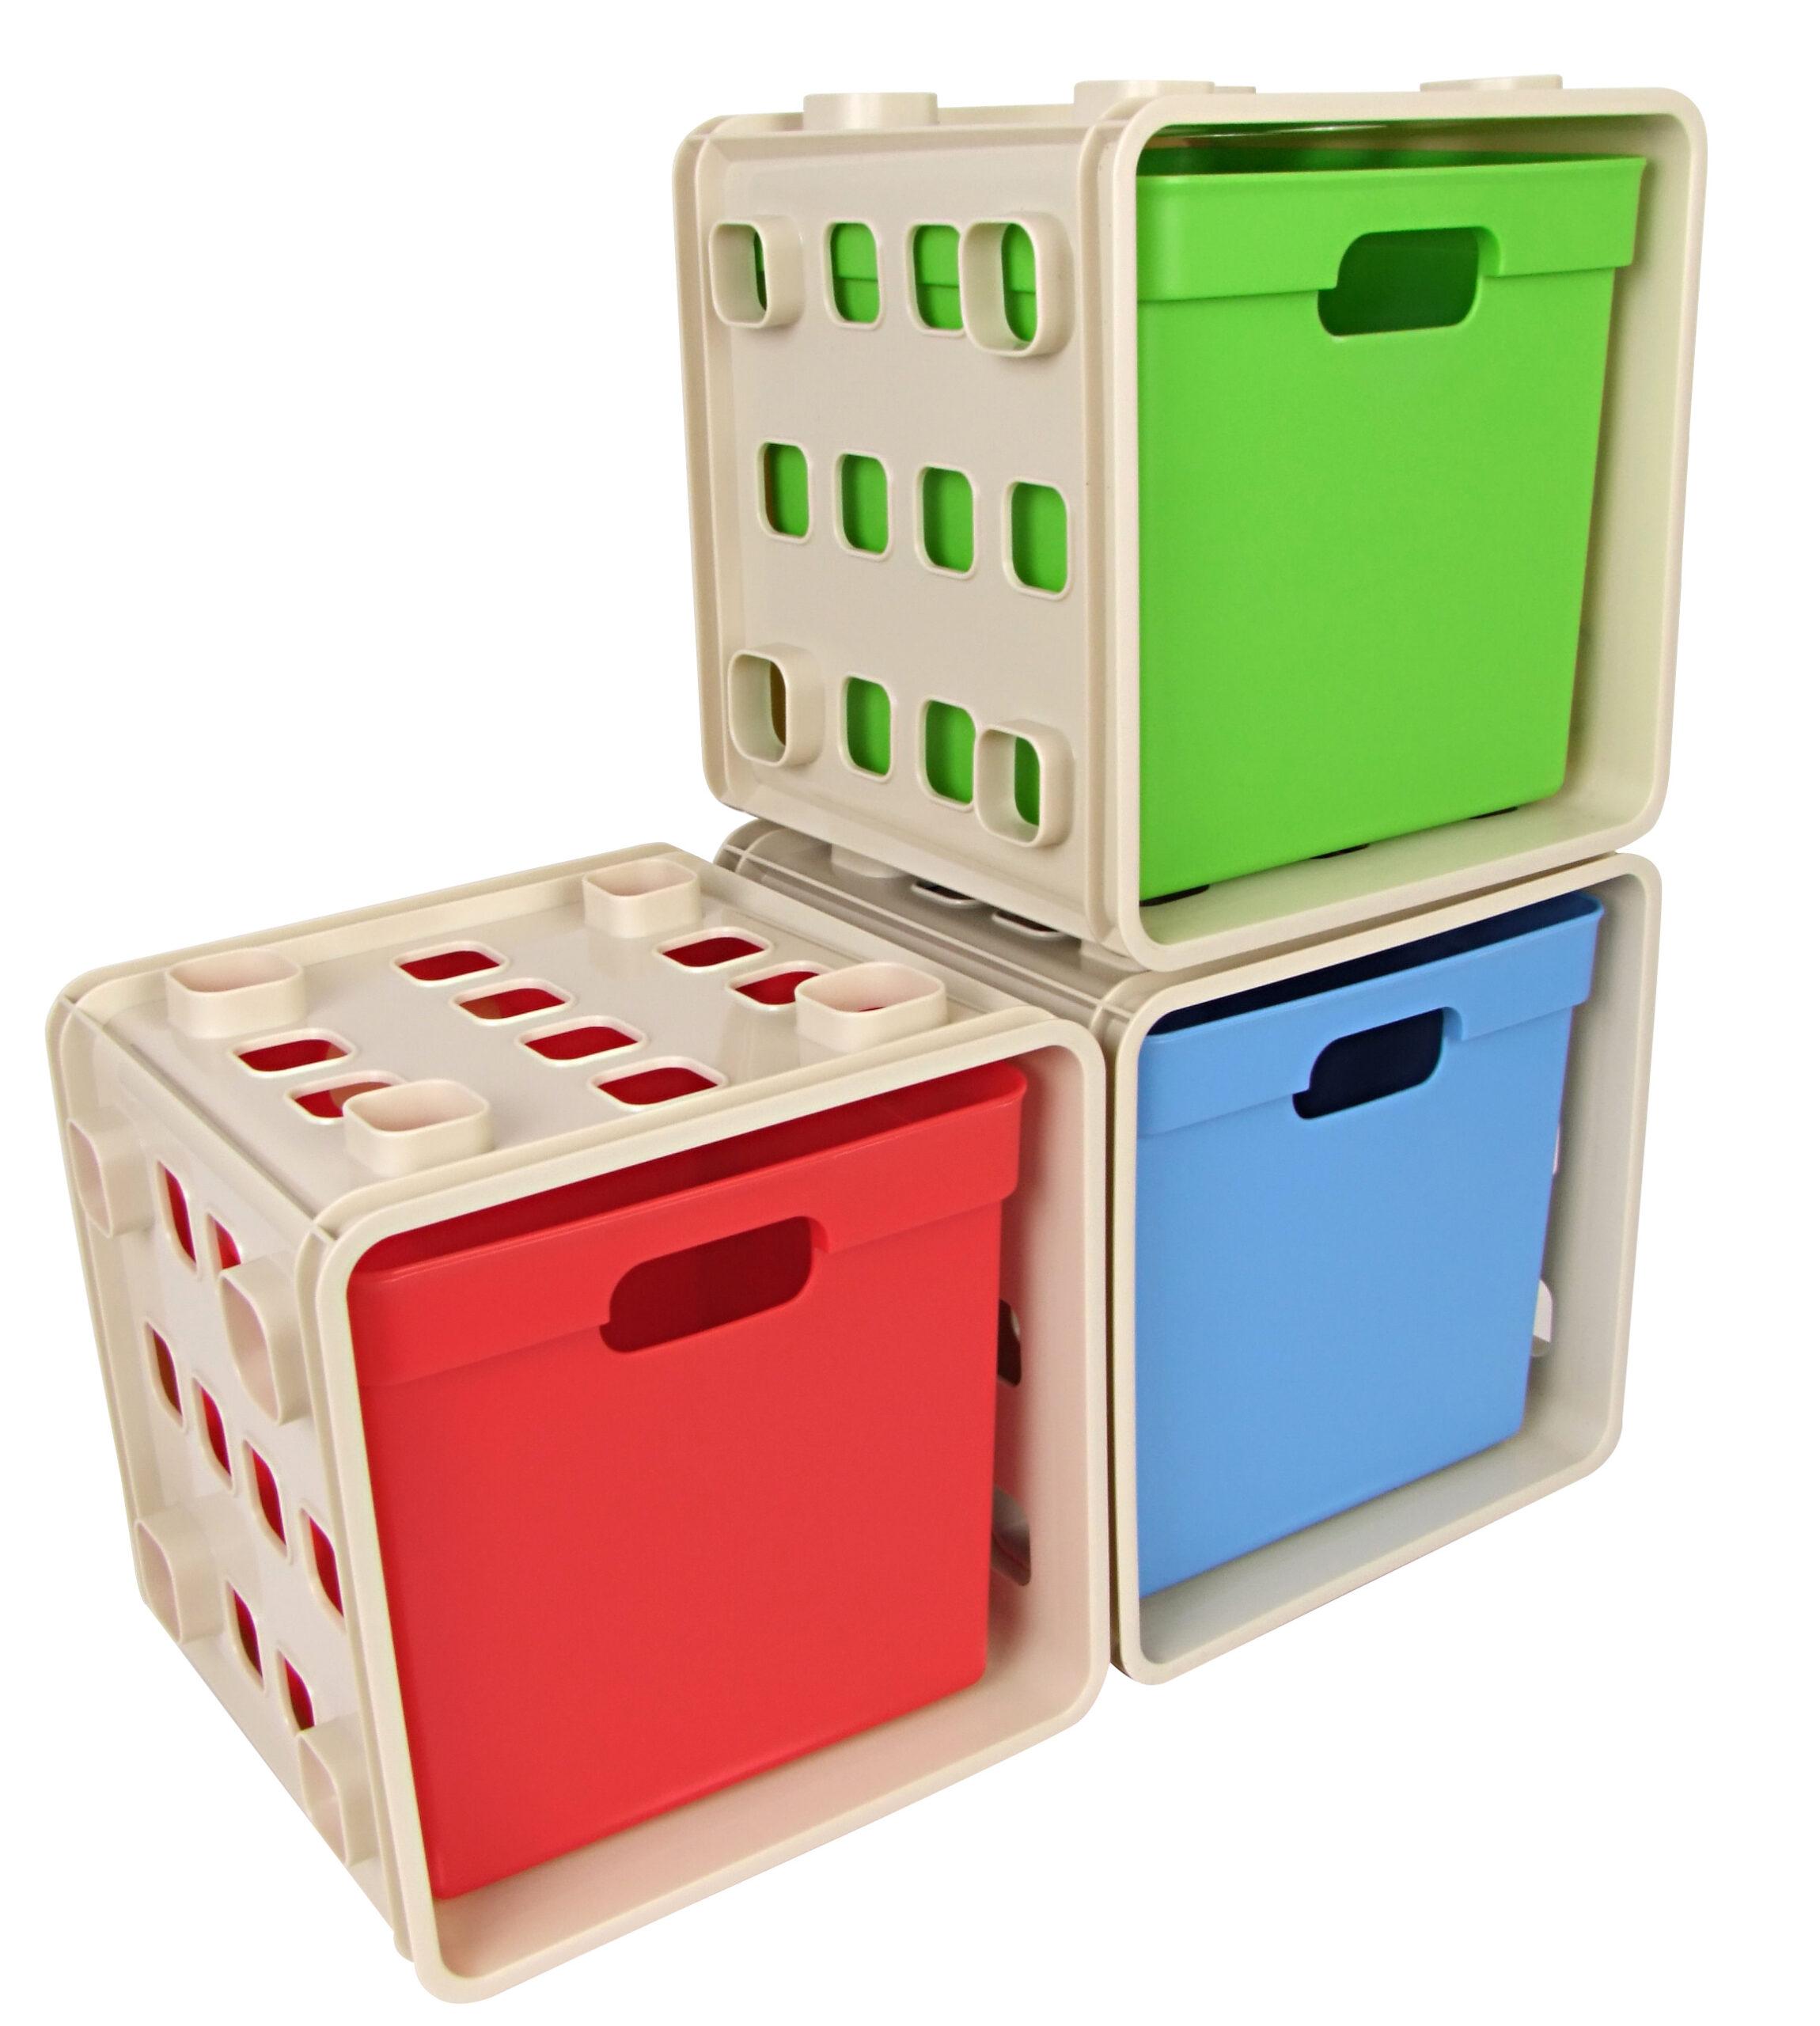 Full Size of Modulregal Steckregal Kinderzimmer Regal Regalsystem Aufbewahrungsbox Garten Regale Weiß Sofa Wohnzimmer Aufbewahrungsbox Kinderzimmer